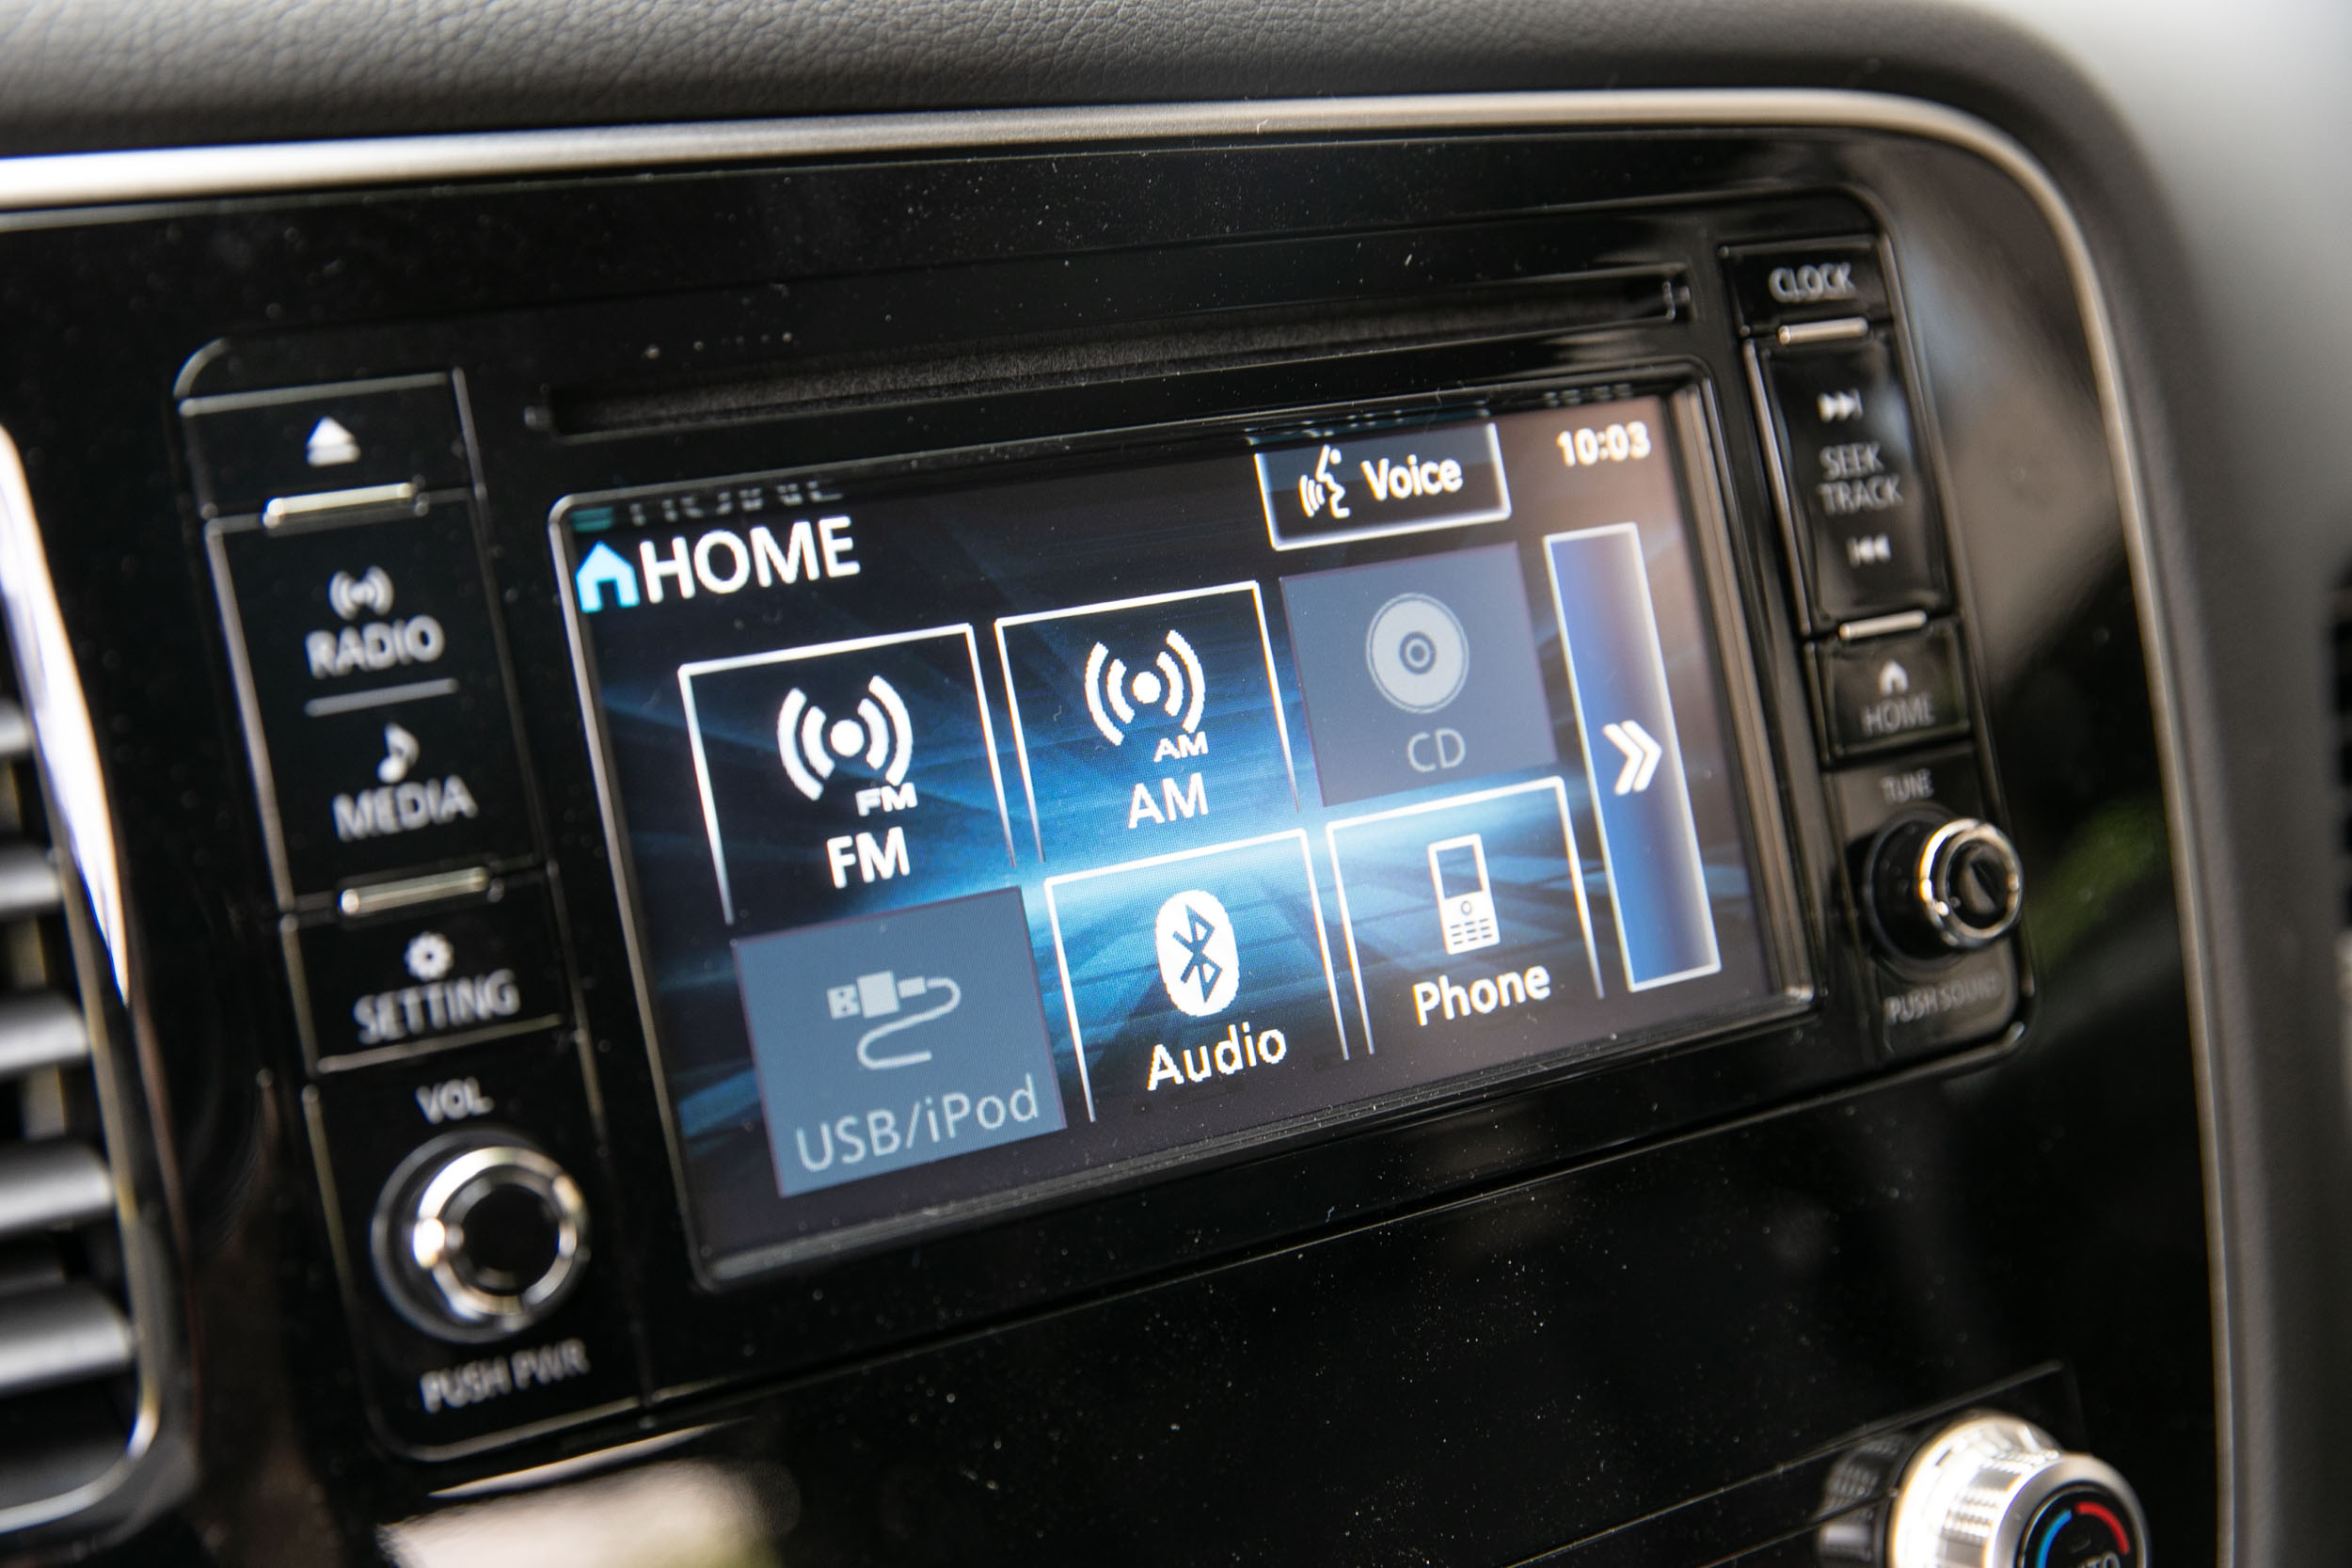 2DIN 觸控螢幕音響主機與當前主流的影音主機有著一定的質感與細膩度差異。